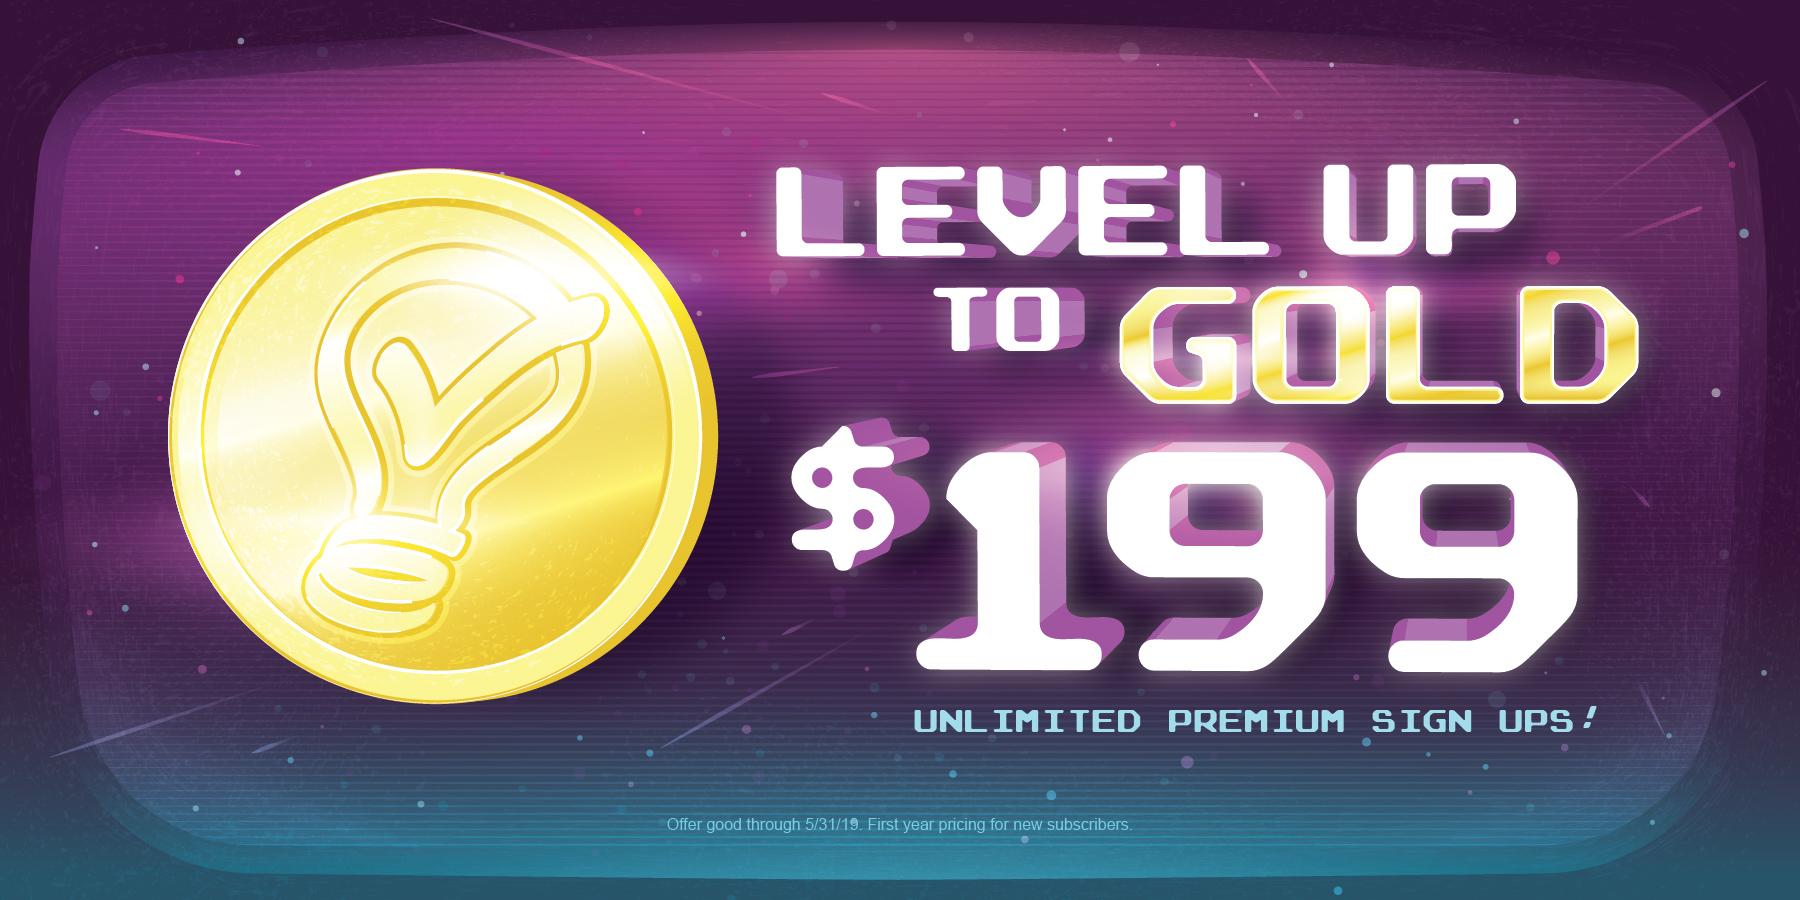 SignUpGenius-Arcade-Level-Up-Gold.jpg